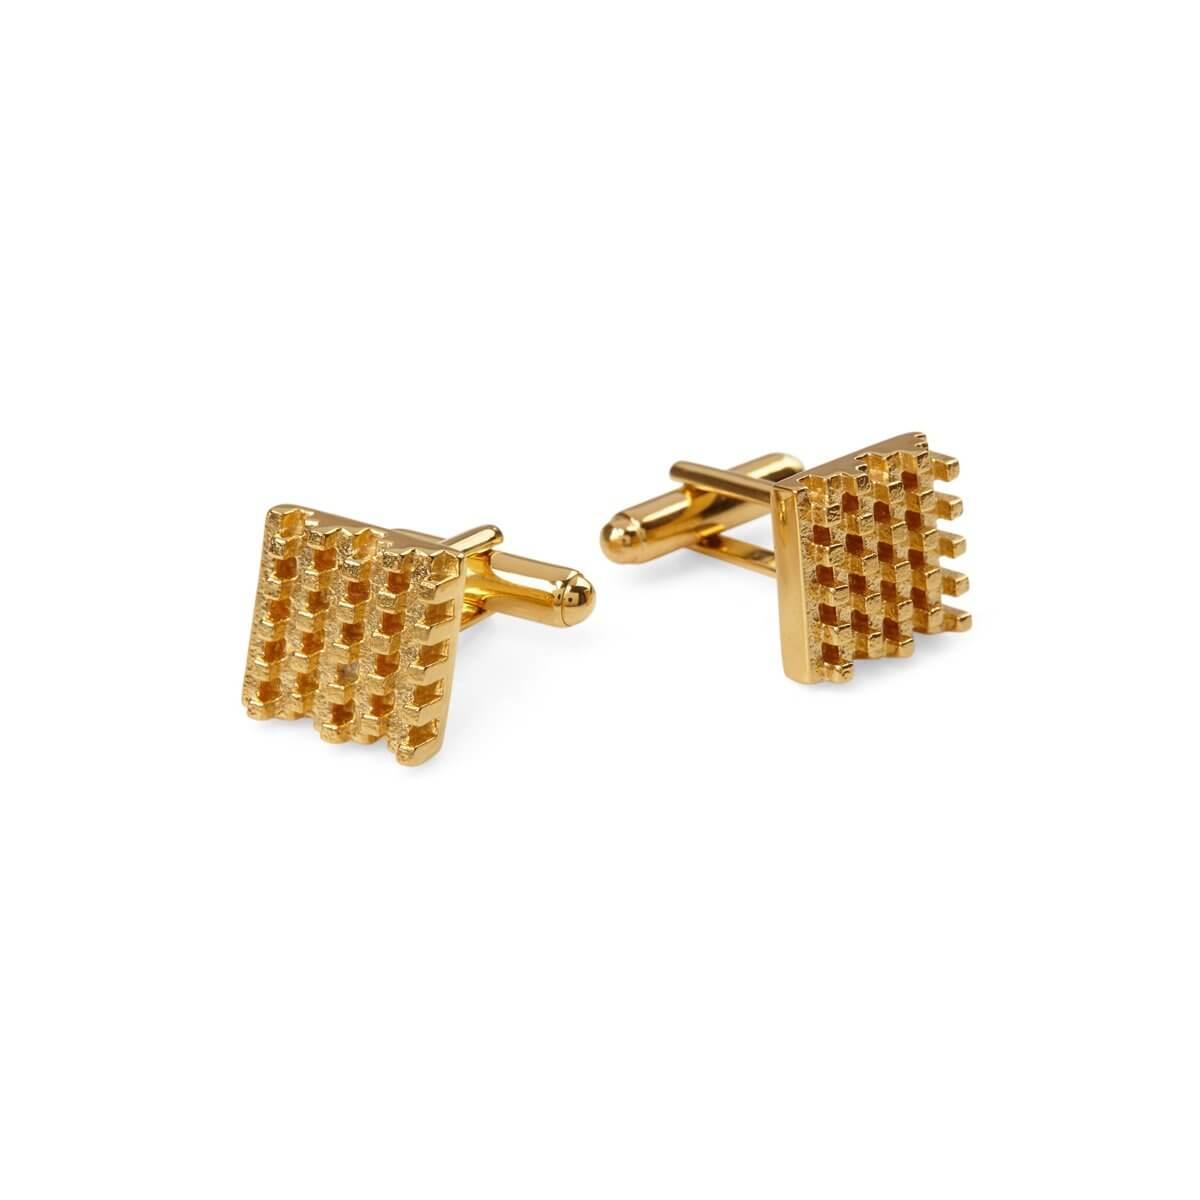 HIve Cufflinks 18 ct Gold Vermeil